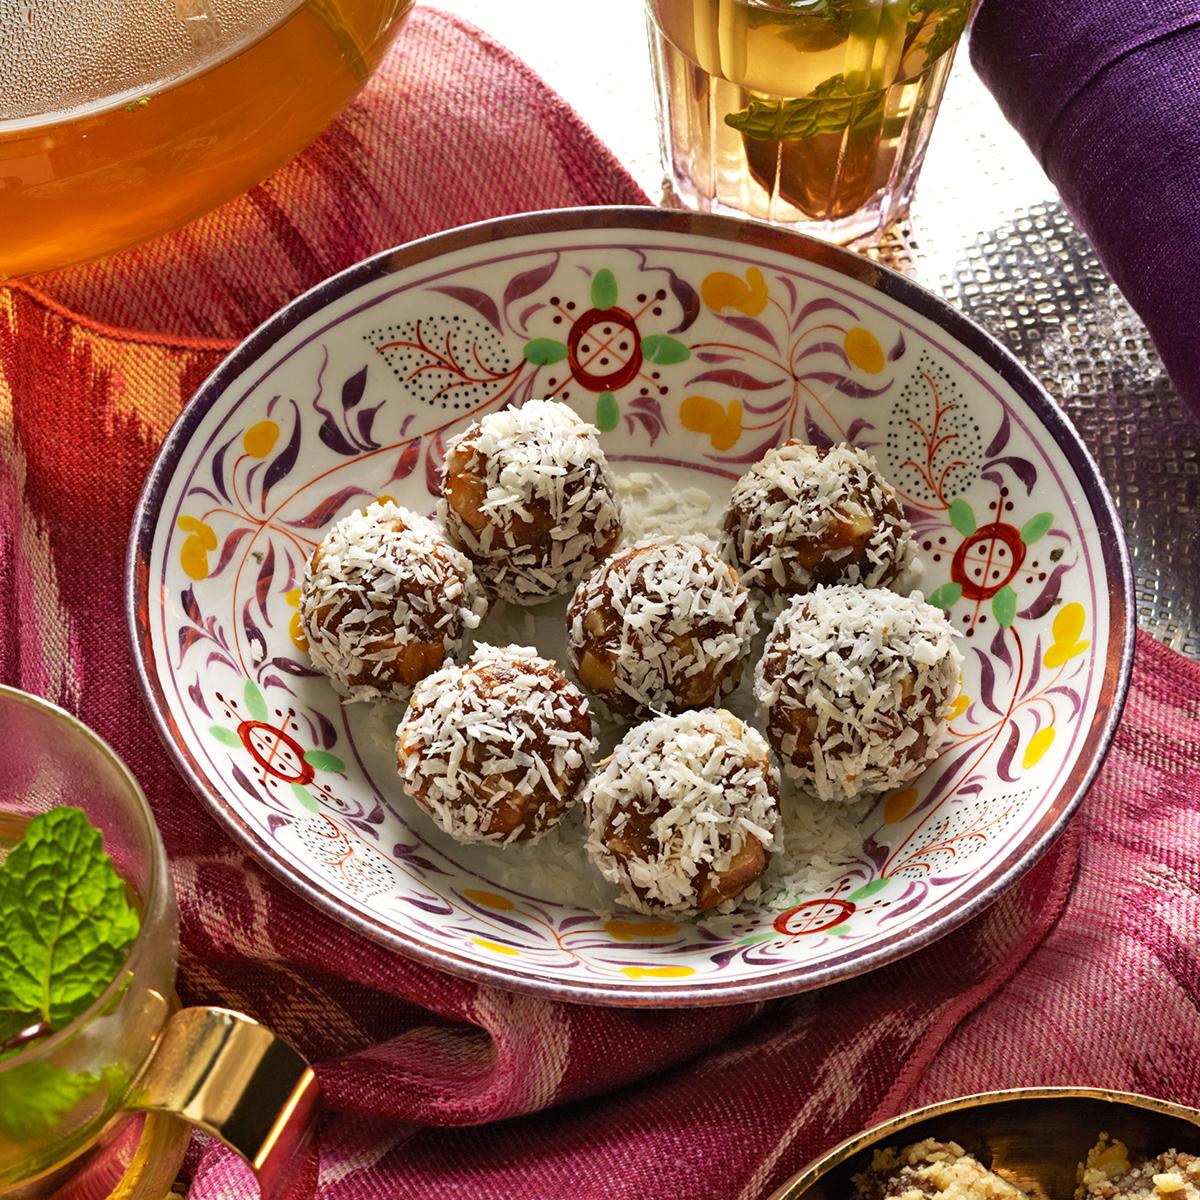 Spiced Date-Walnut Balls